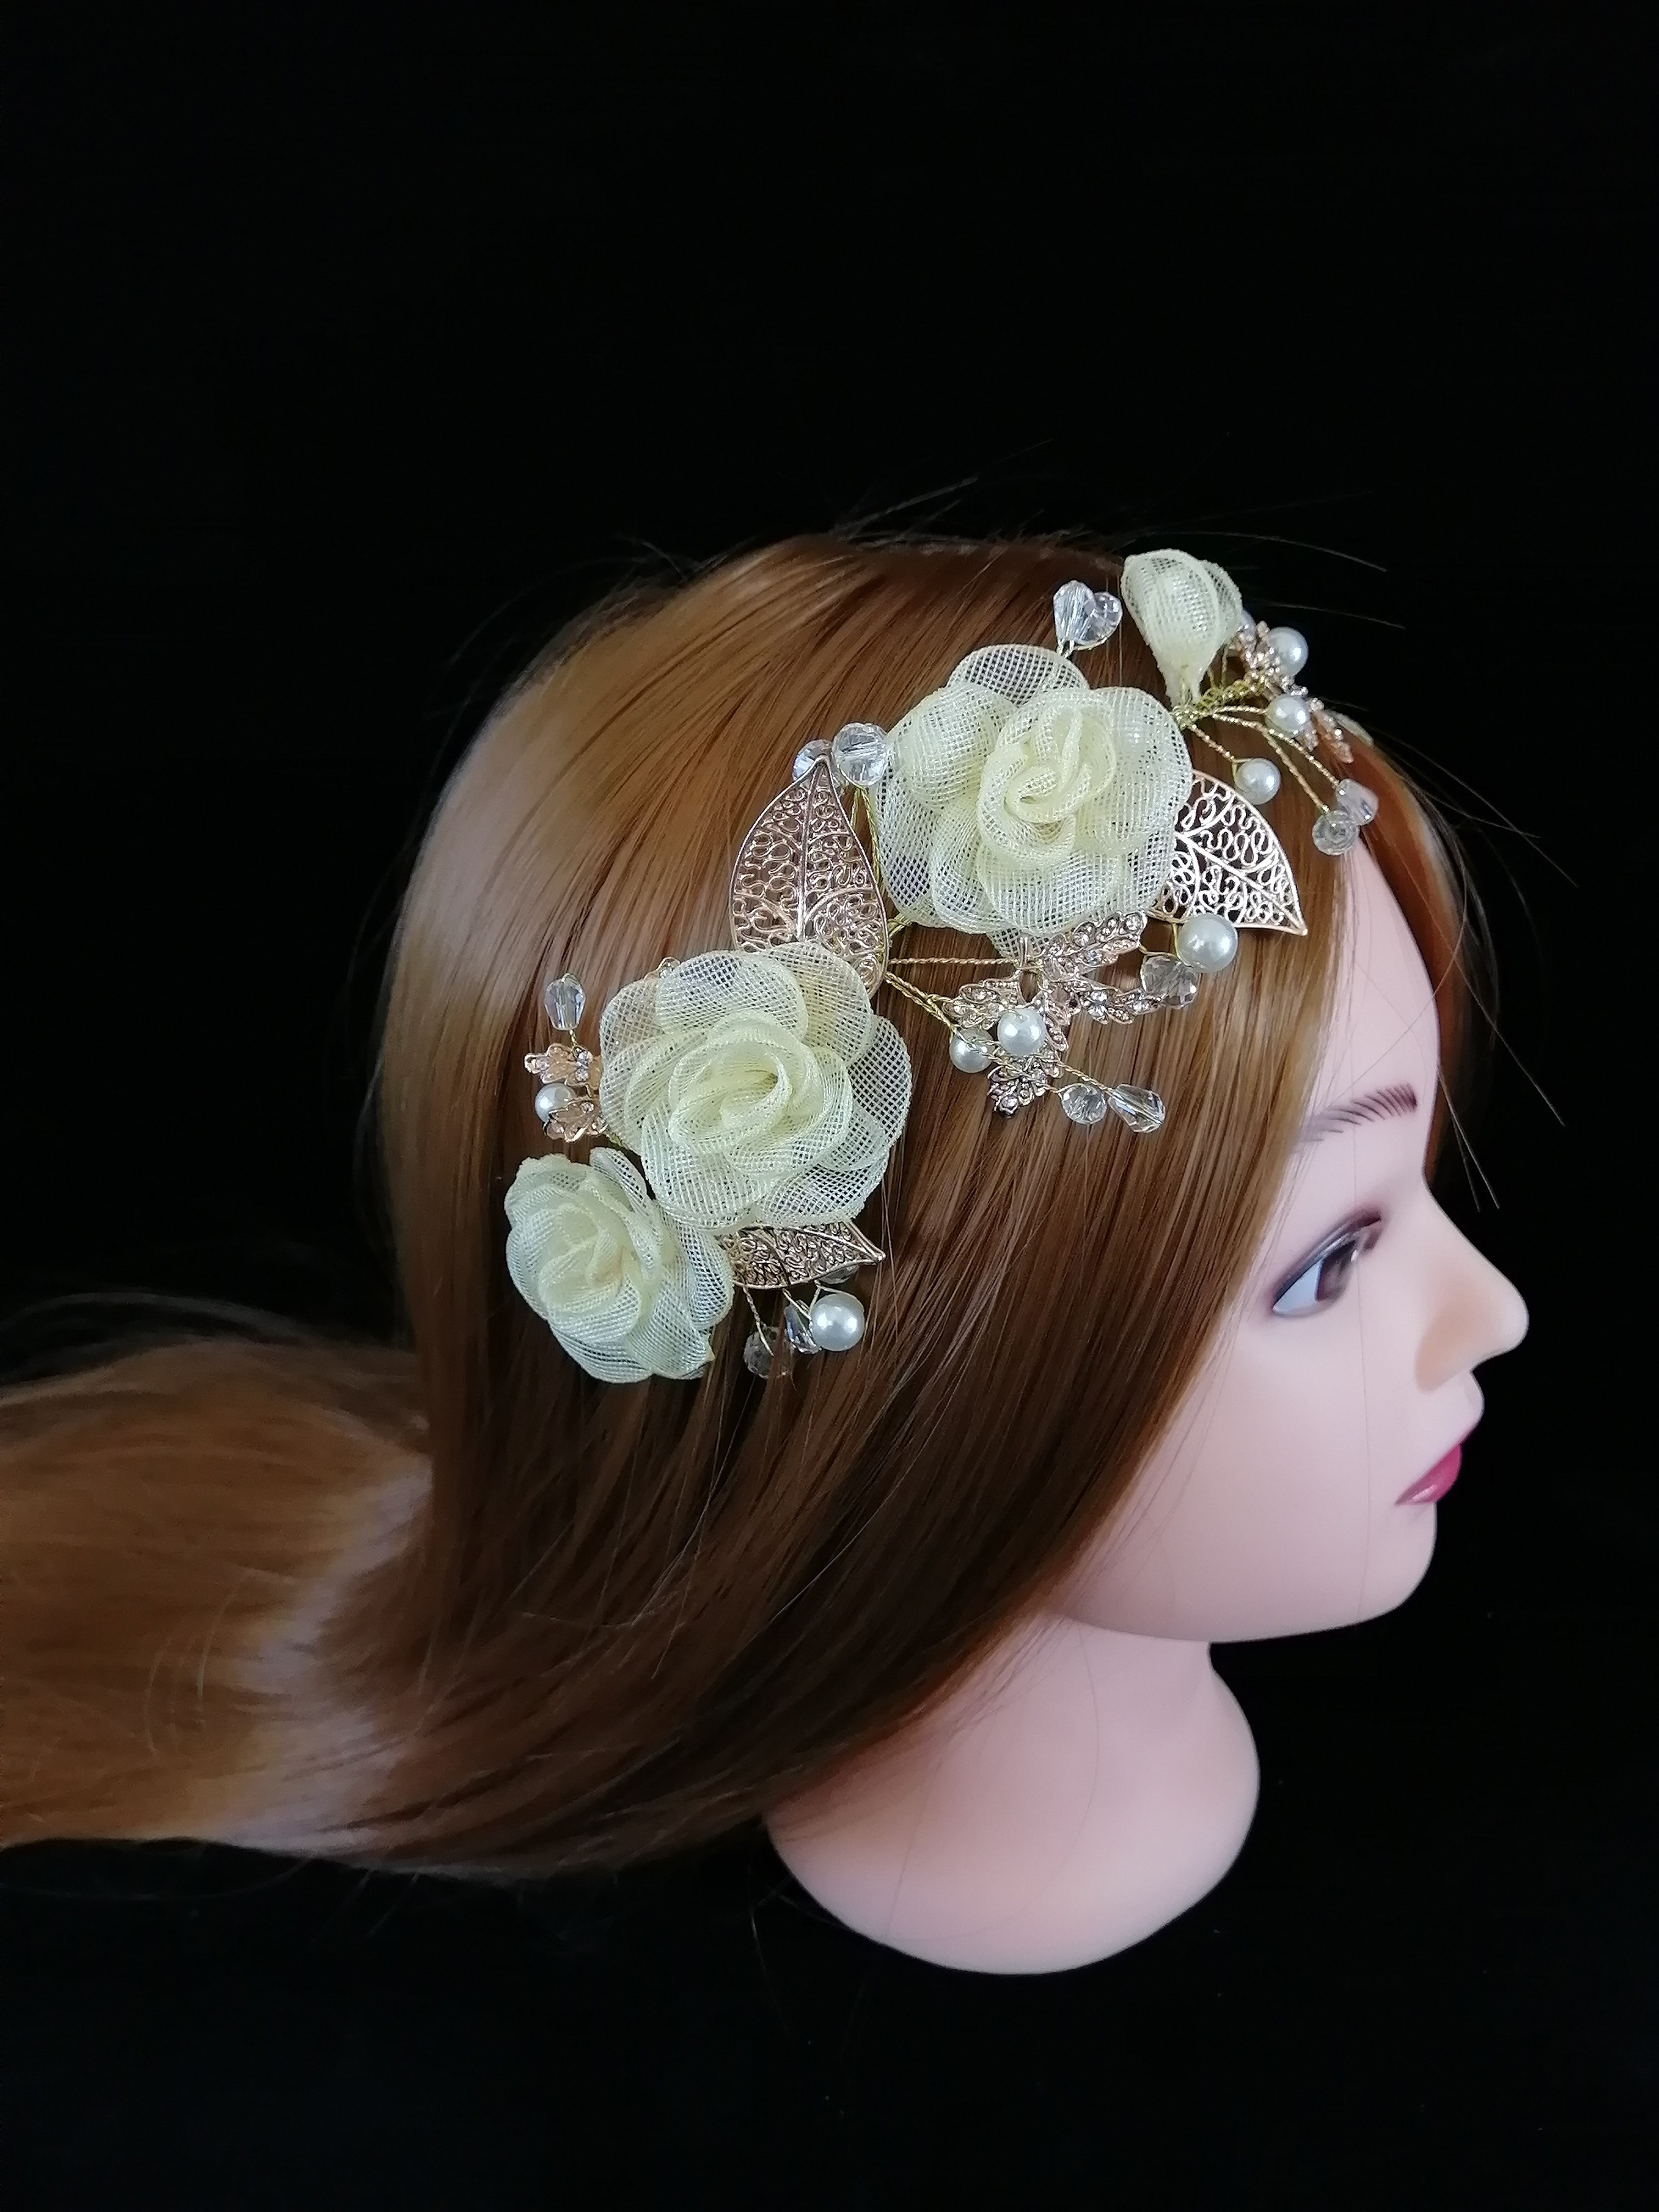 Korean Fashion Luxury Sparkly Yellow 3D FLoral Hairband Bridal Wedding Rhinestone Tiara For Women Hair Comb Accessories Jewelry